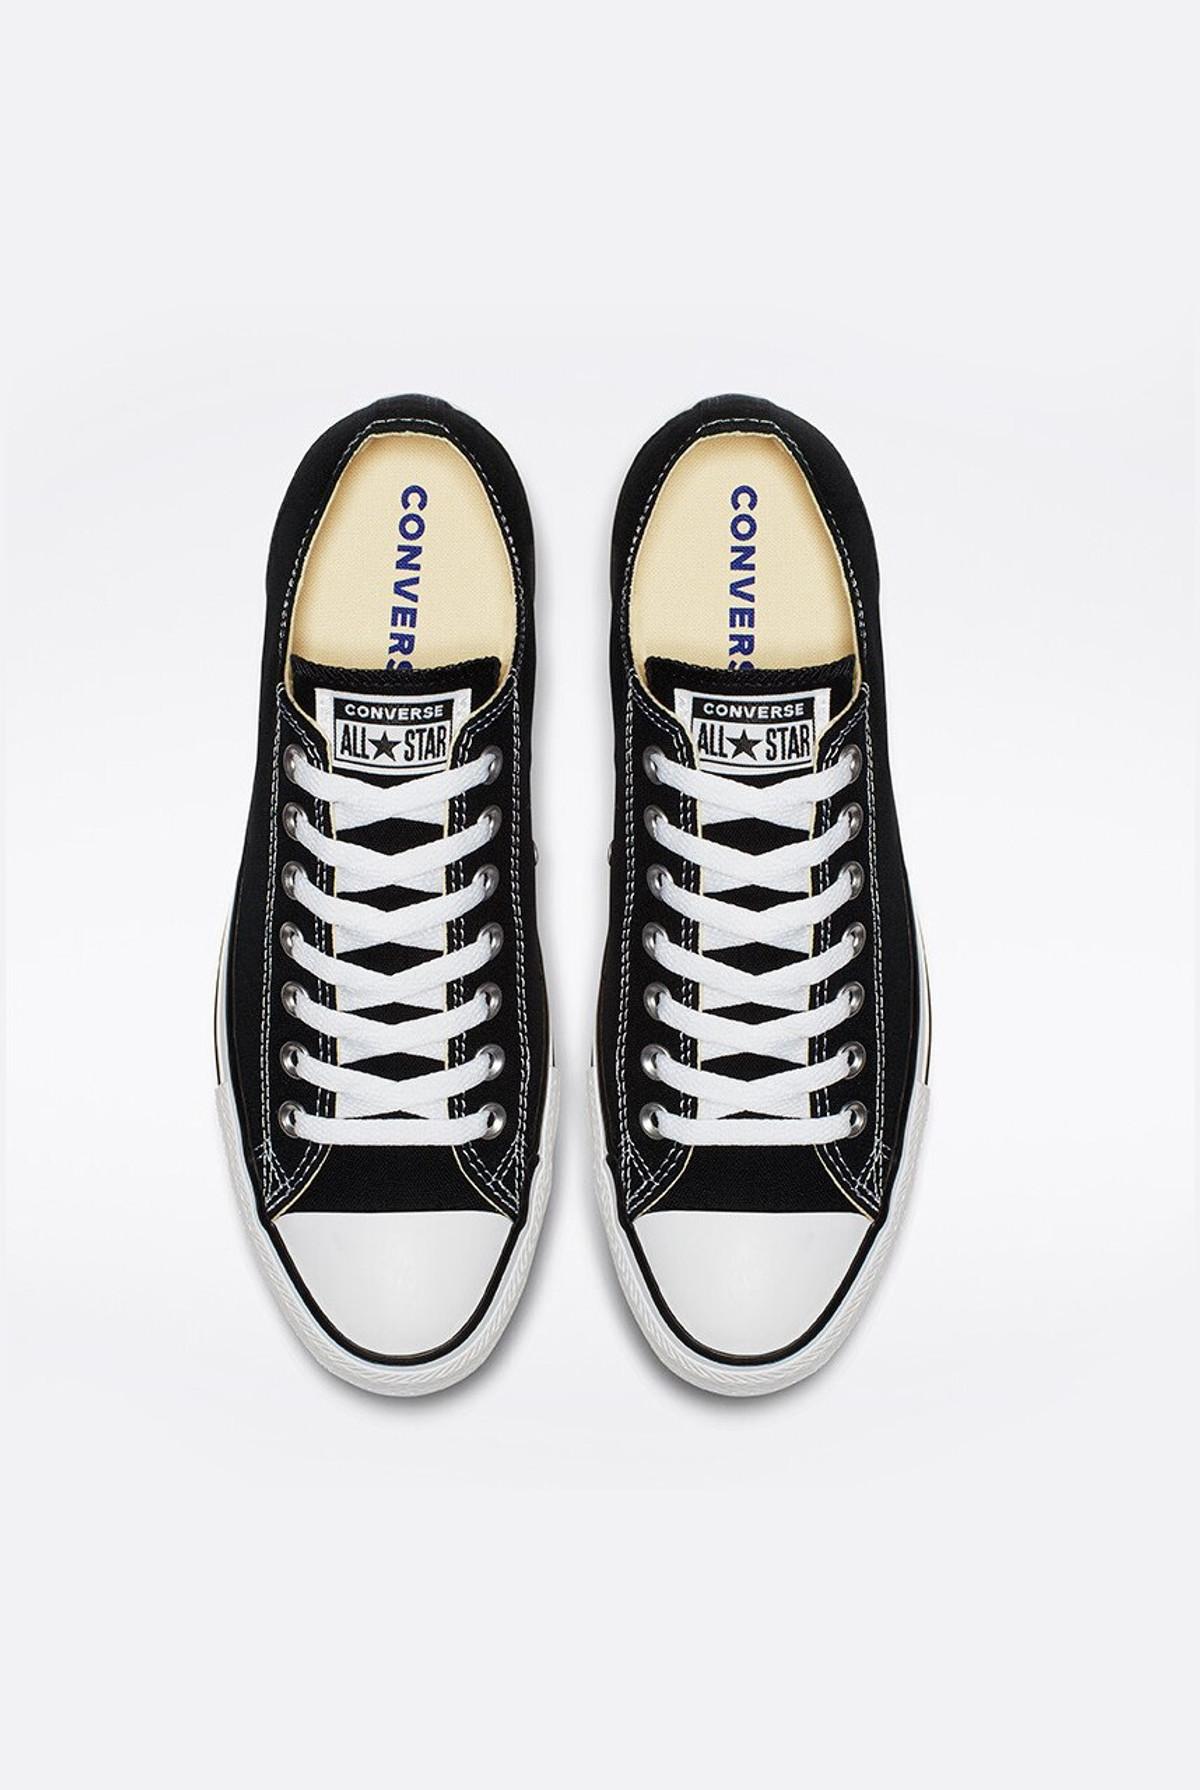 Converse Running Shoe CON150763C